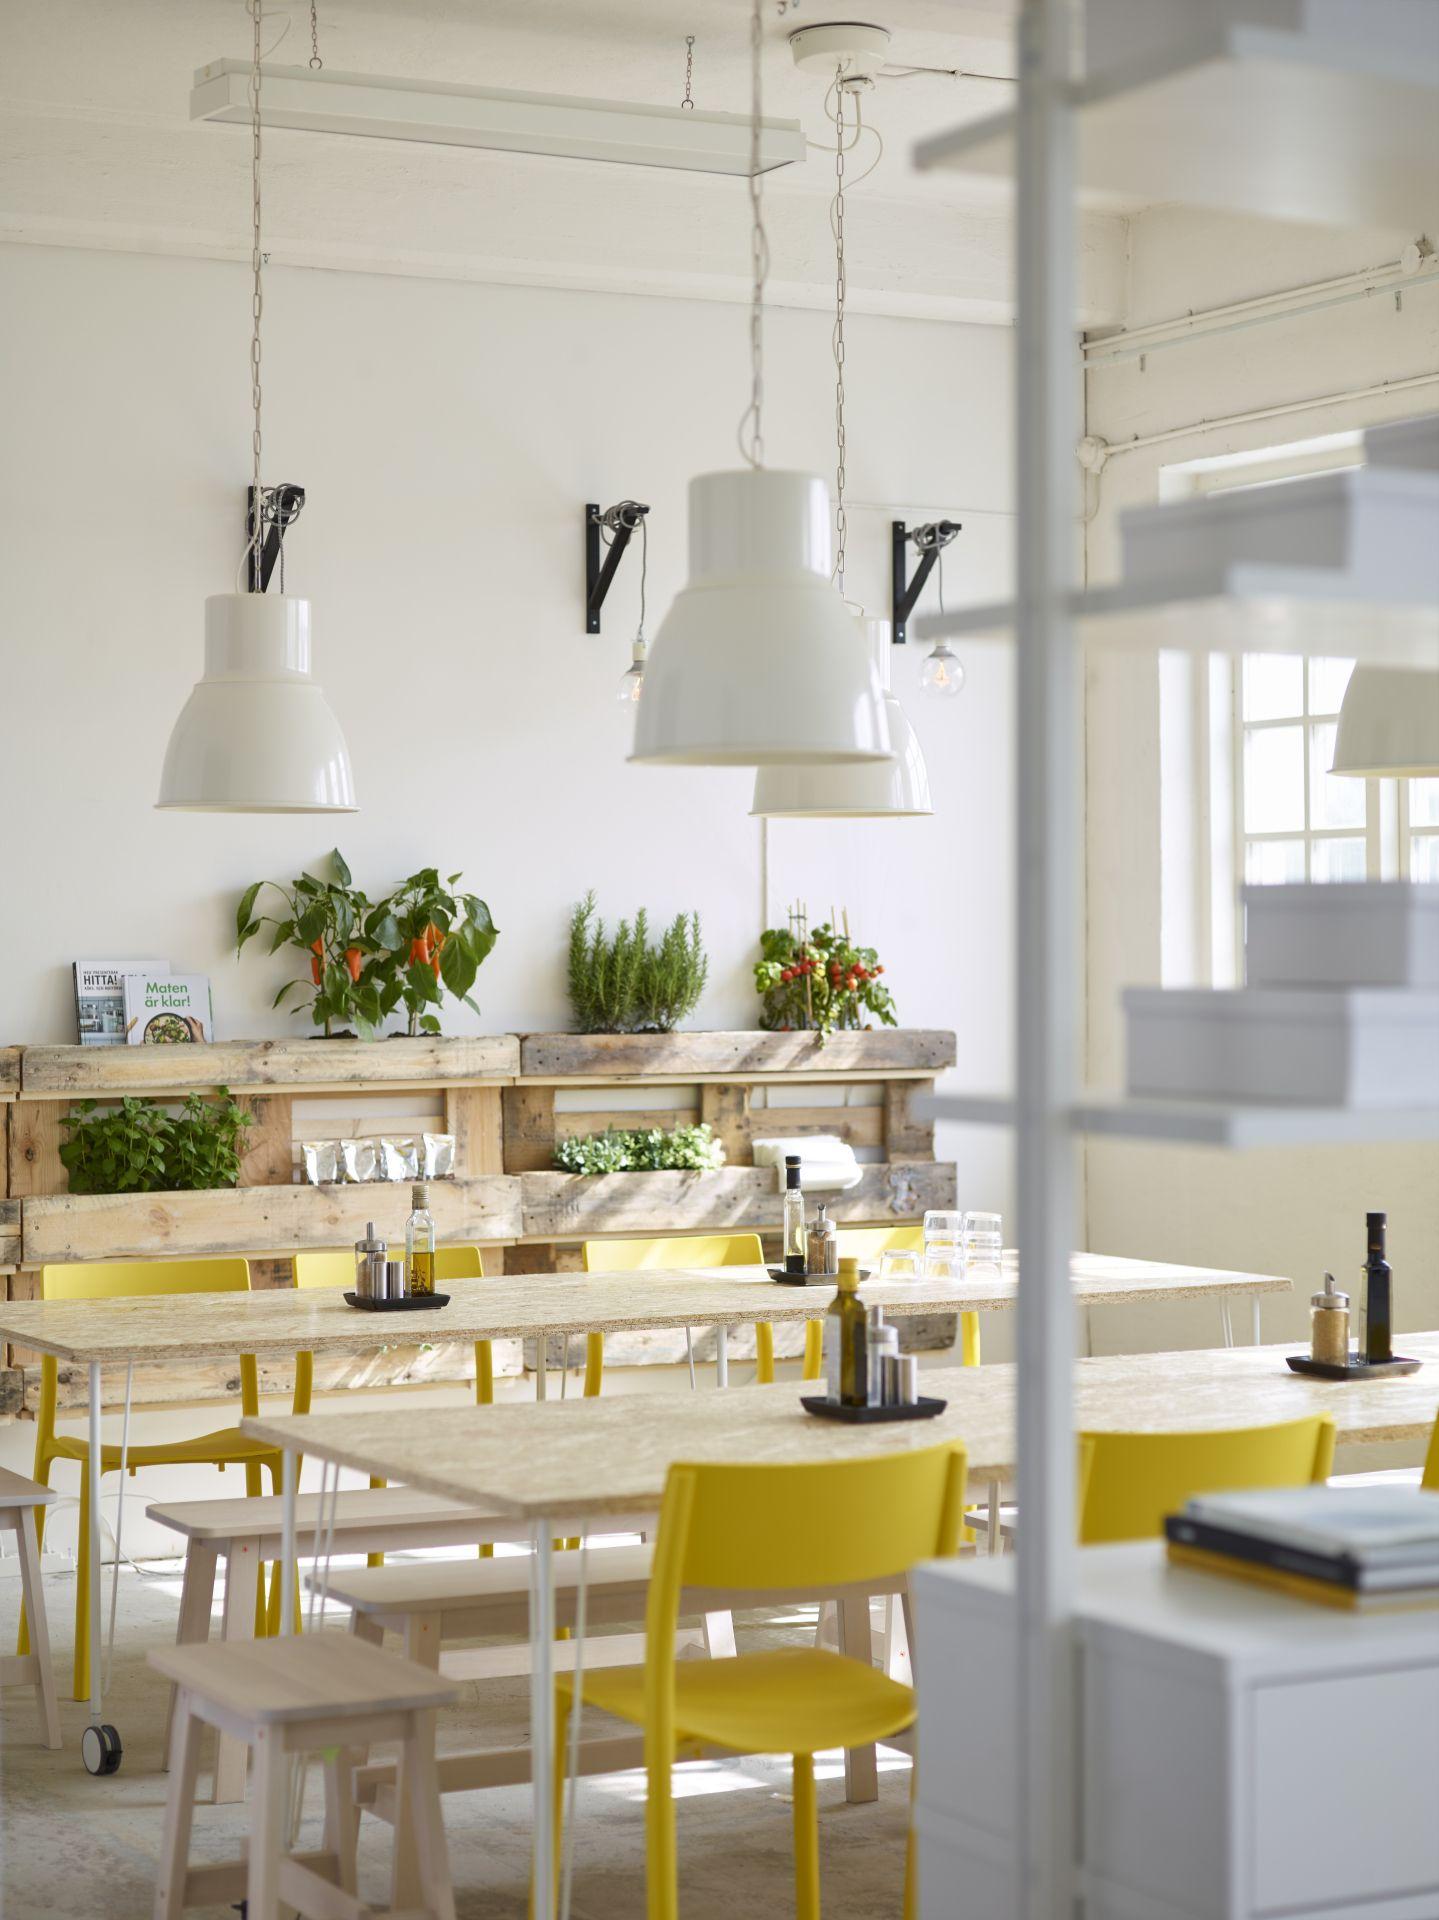 HEKTAR Hanglamp, wit | Verlichting | Pinterest | Catalog, Dining and ...